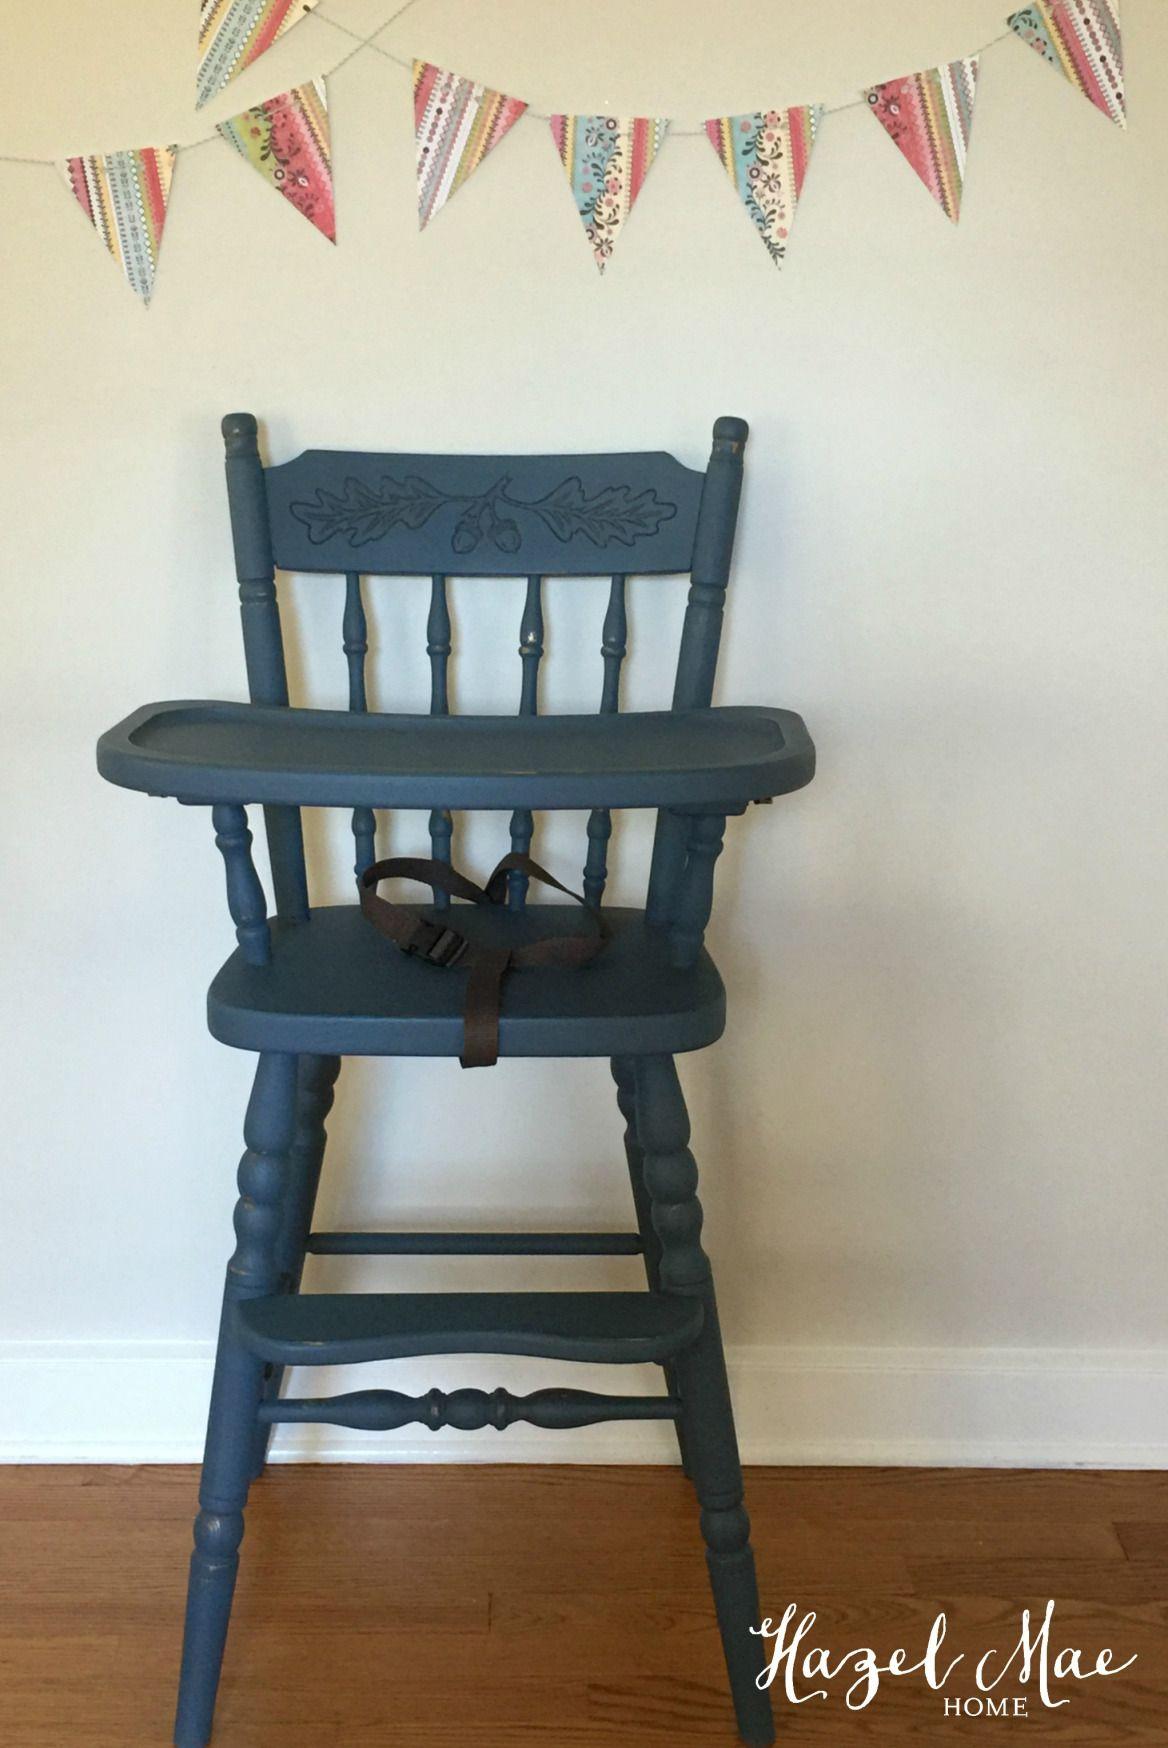 Vintage Painted High Chair! Hochstuhl, Kinder möbel, Stühle